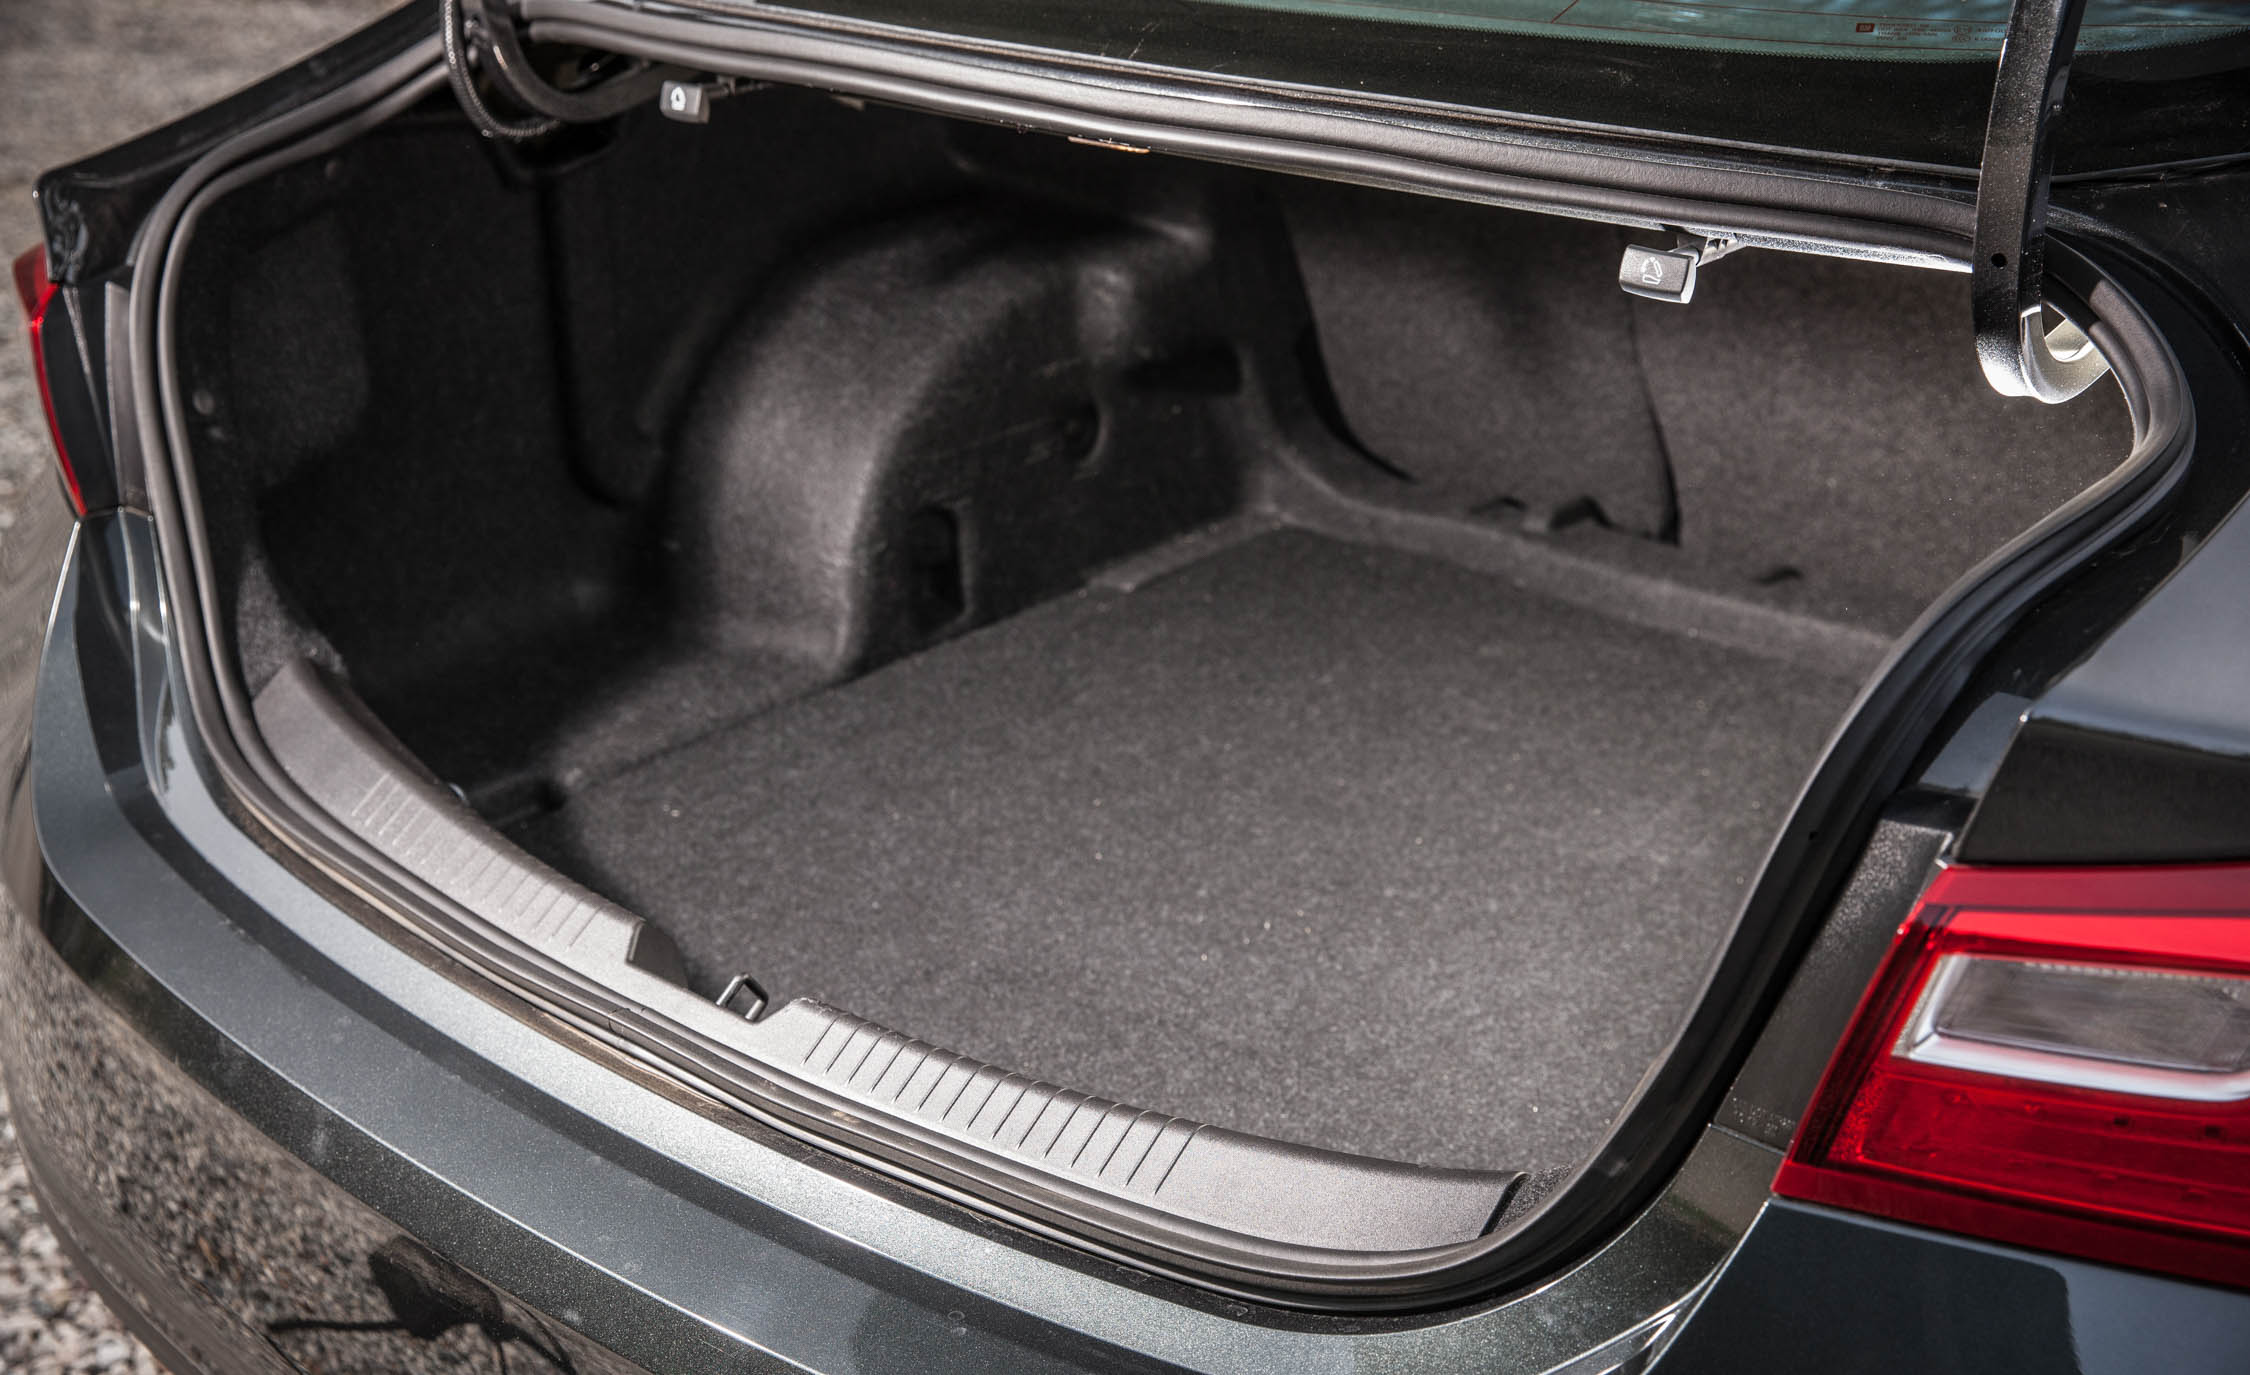 2016 Chevrolet Malibu LT Interior Cargo